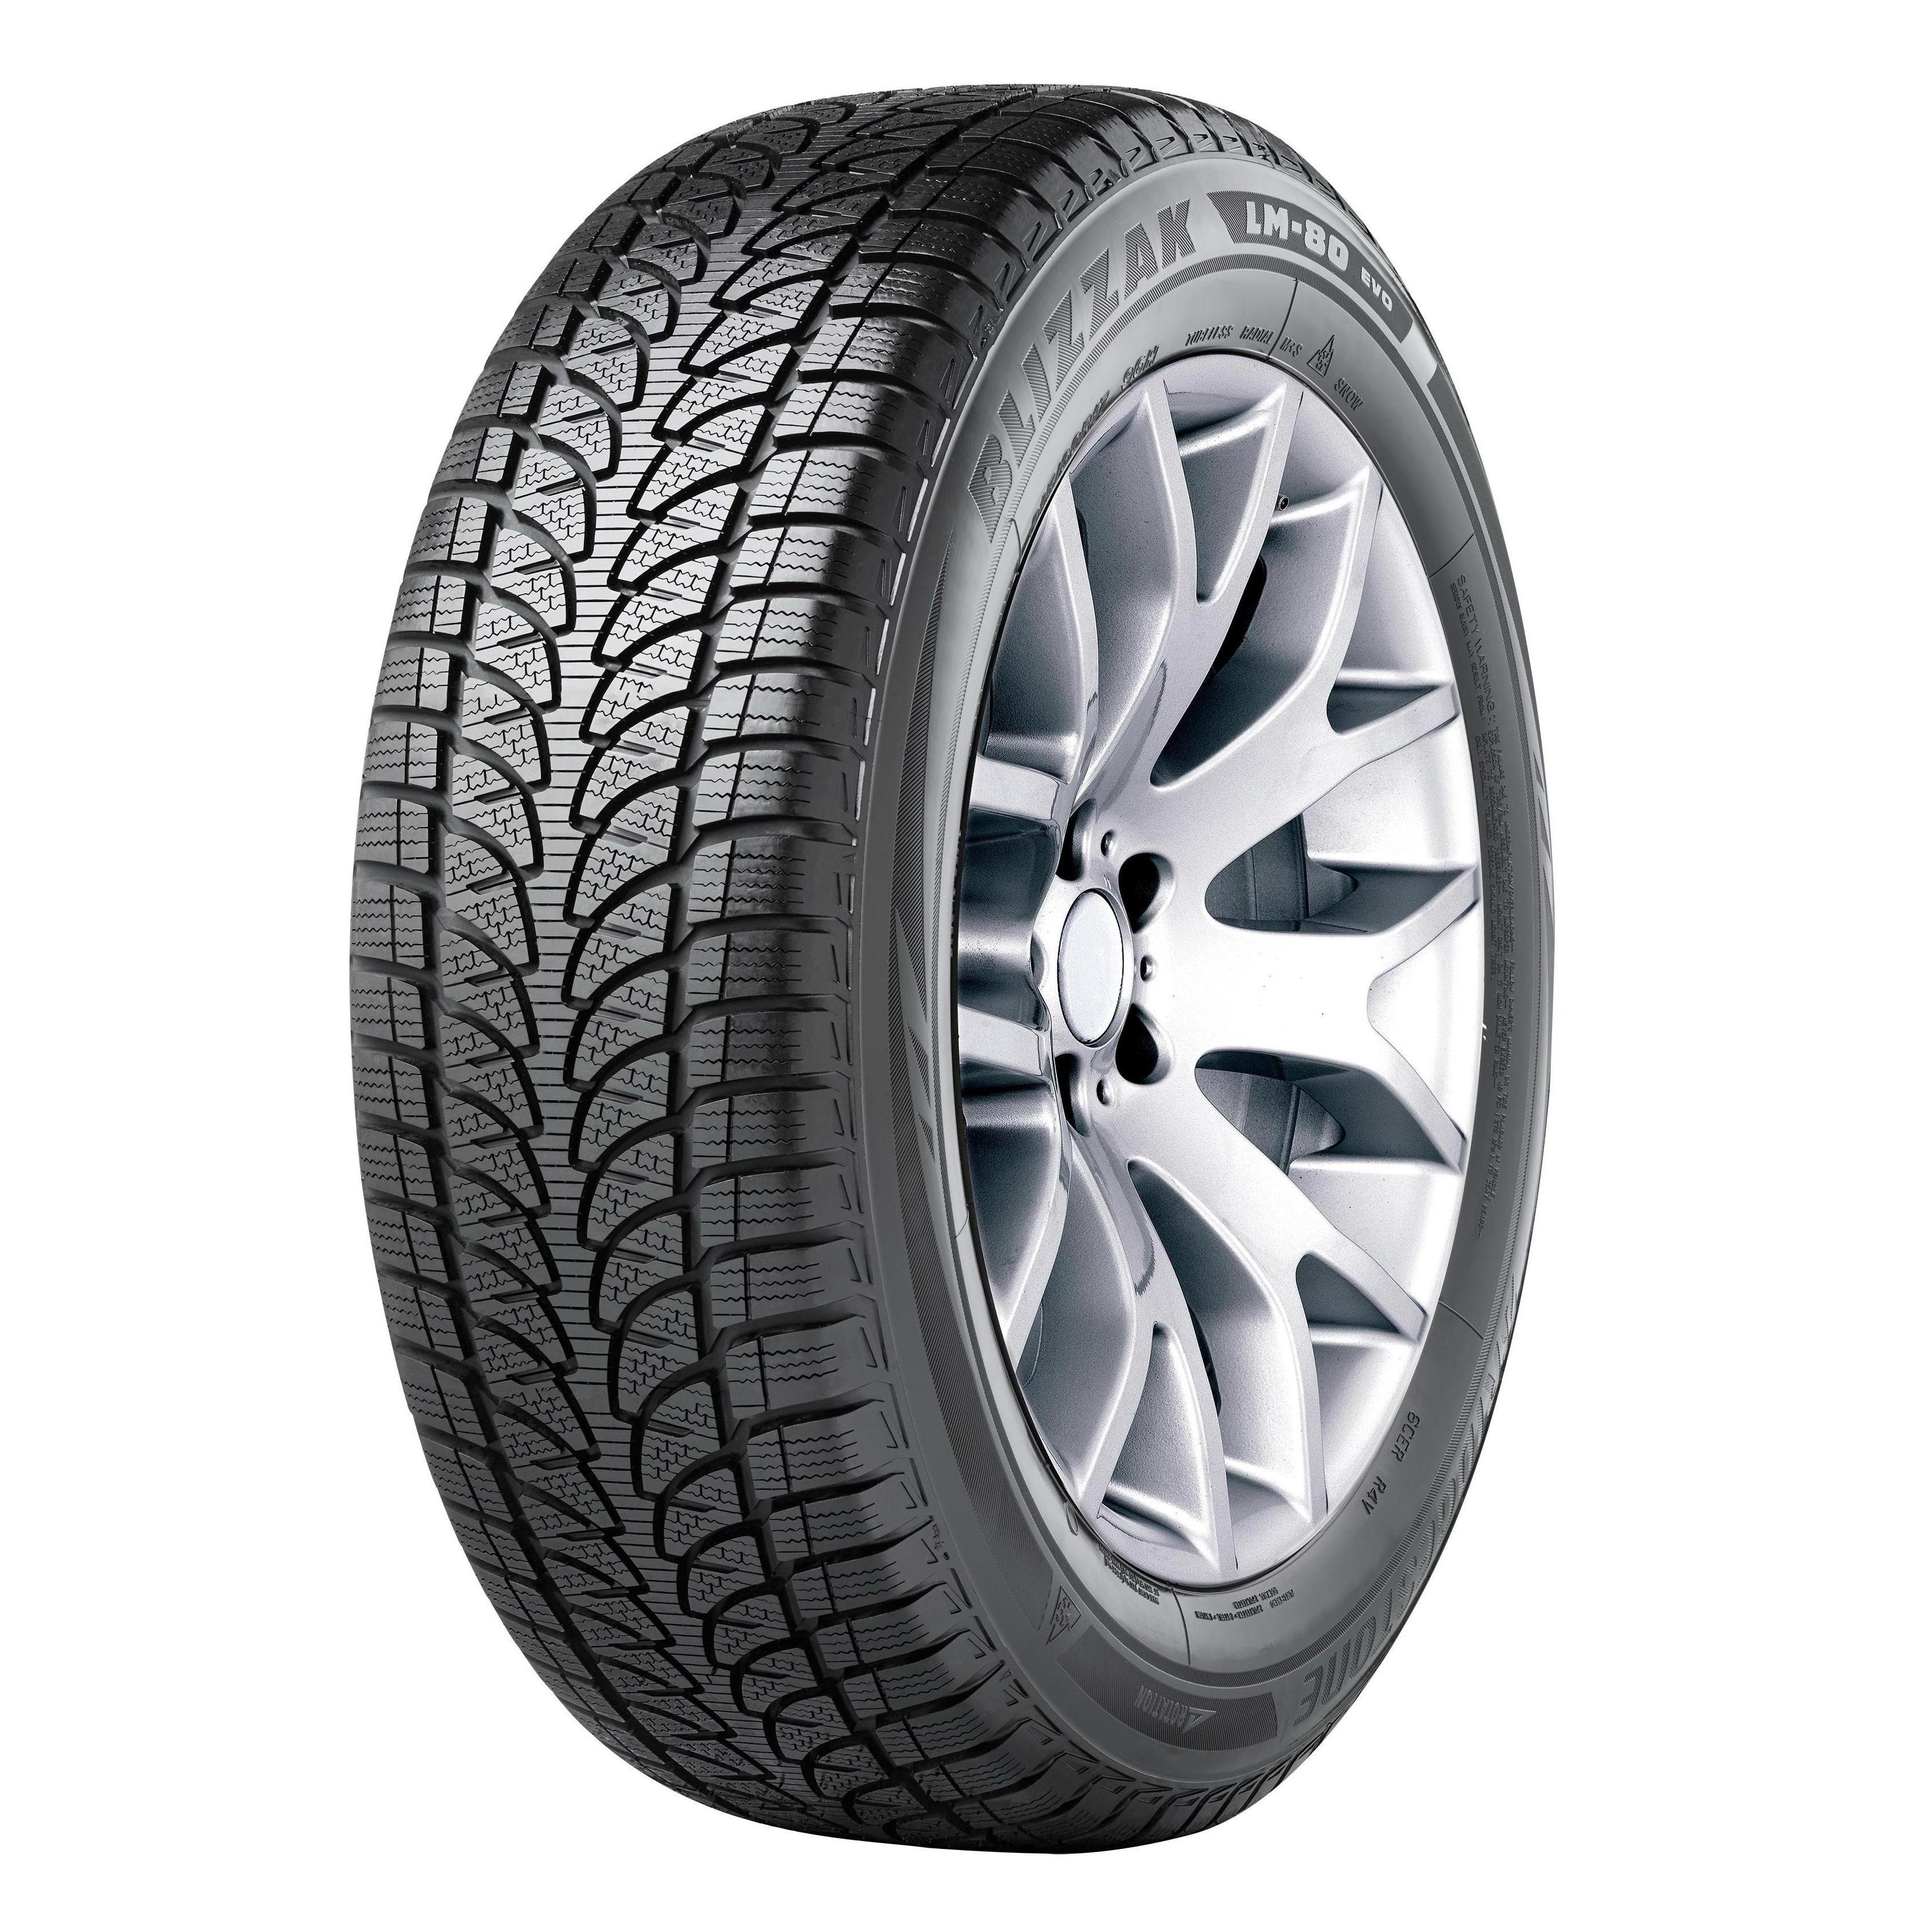 Bridgestone Blizzak LM 80 Evo 215/70 R16